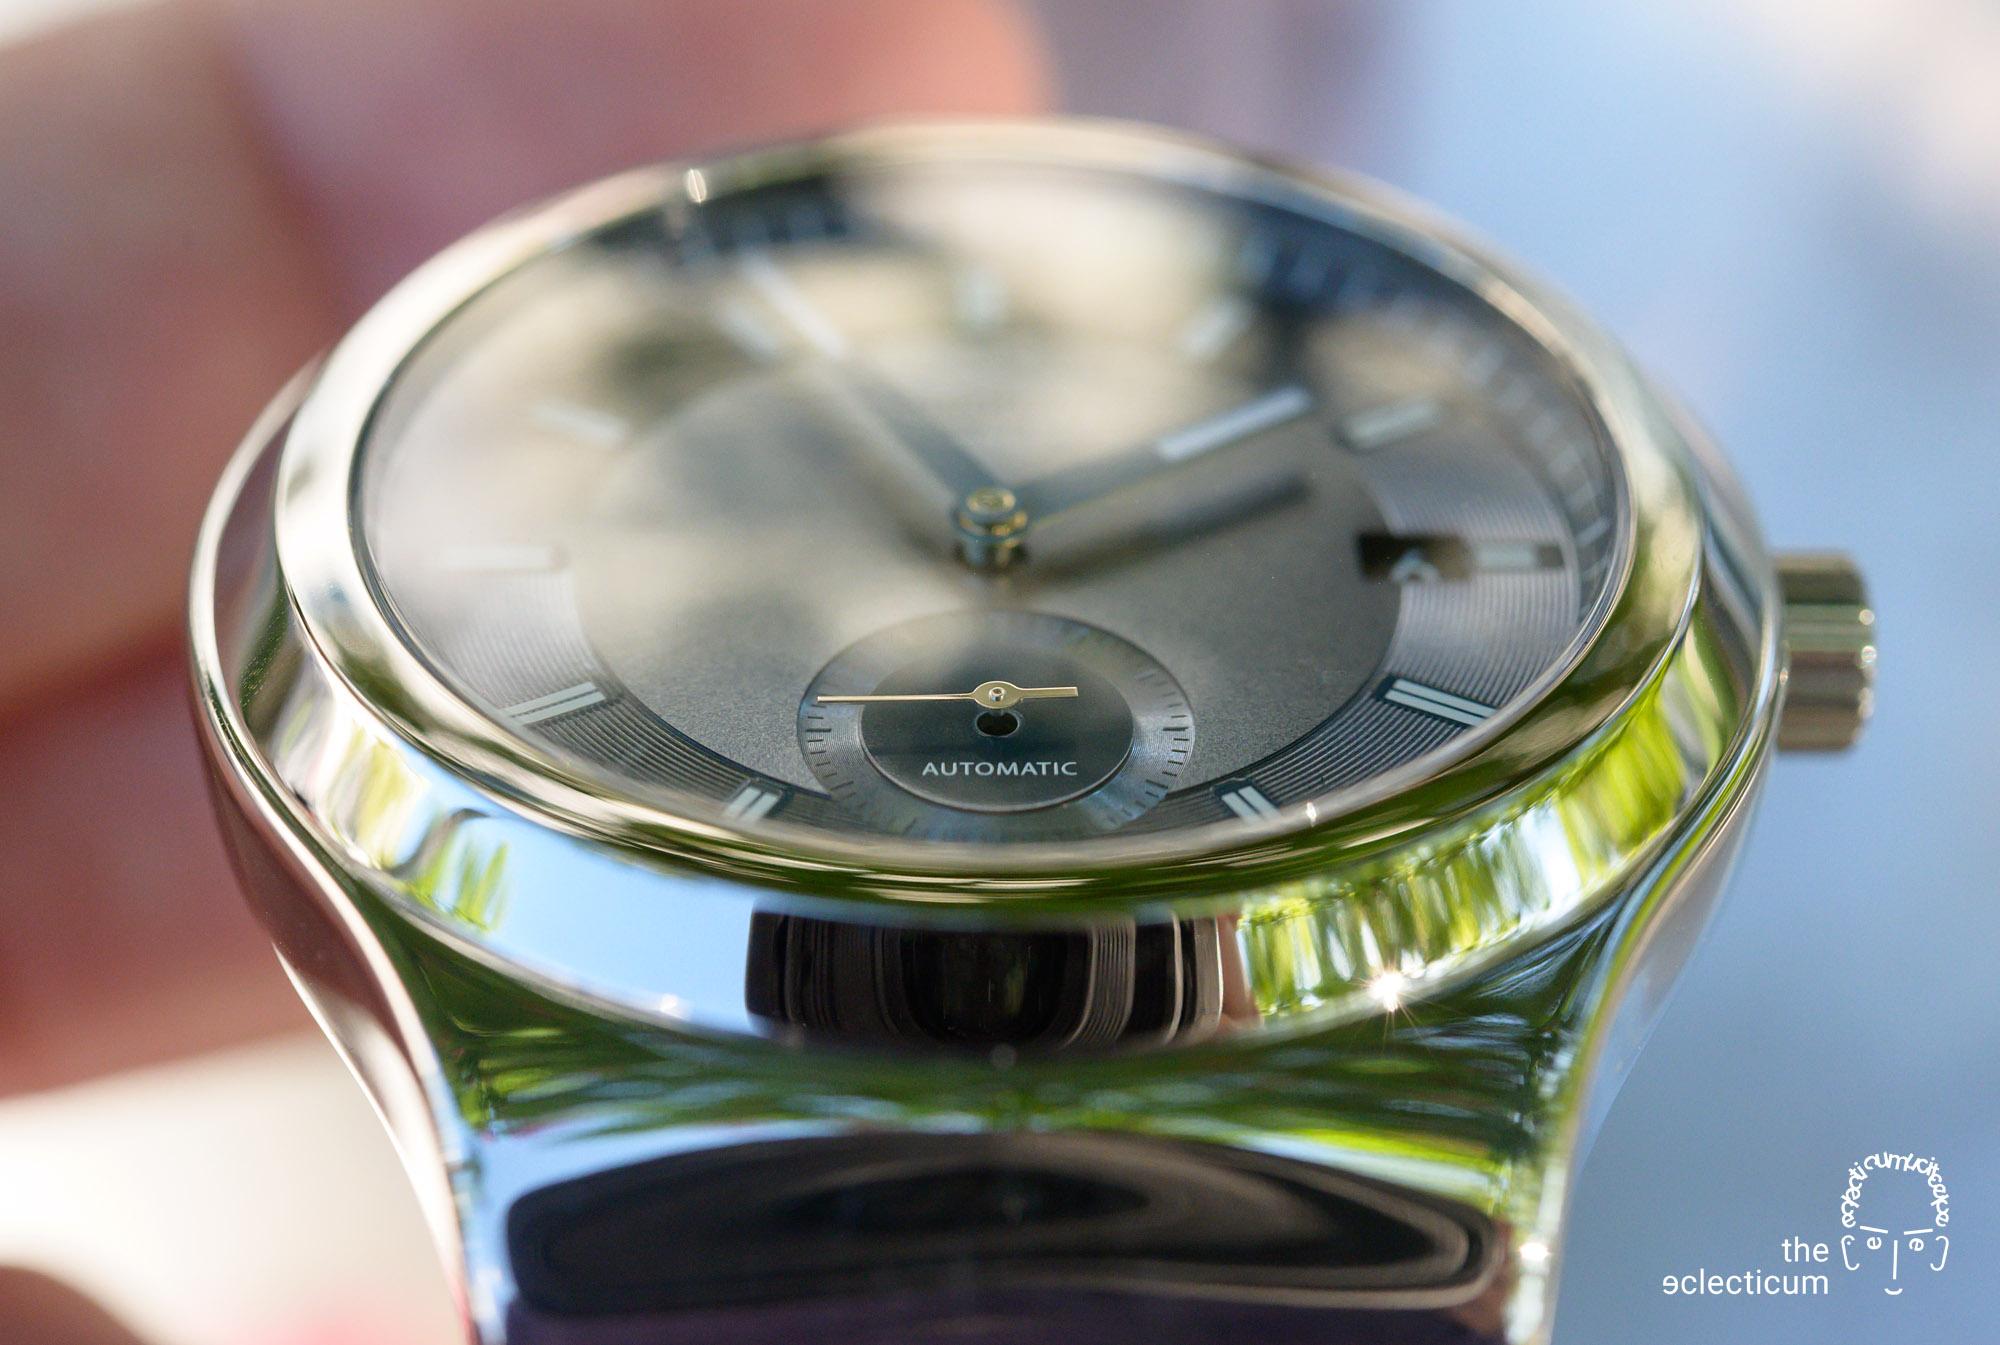 Swatch Sistem51 Petite Seconde automatic blue dial detail